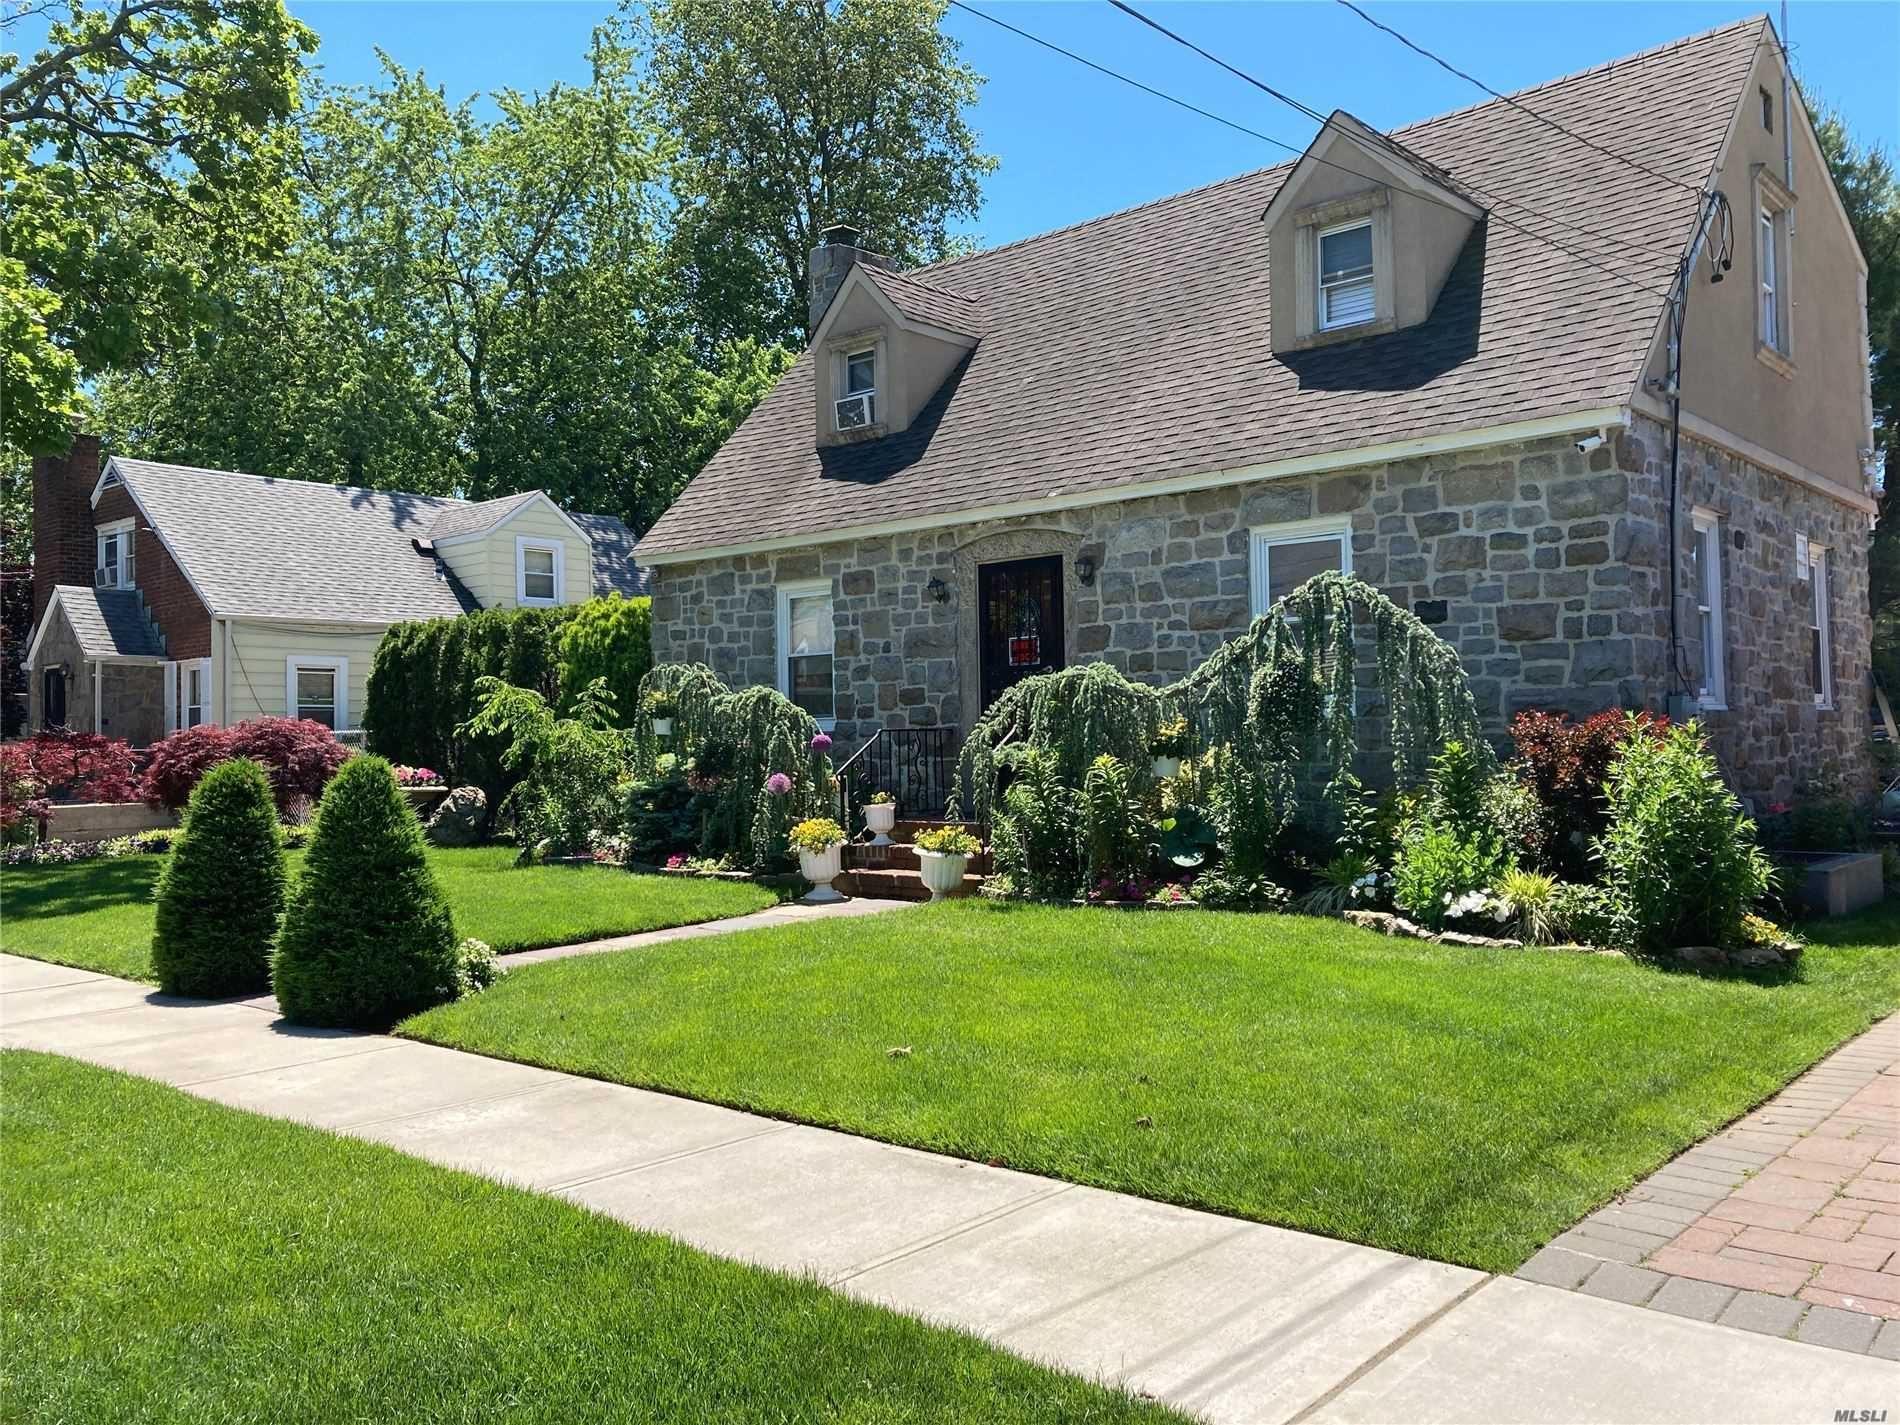 134 Allen St, Hempstead, NY 11550 - MLS#: 3221611